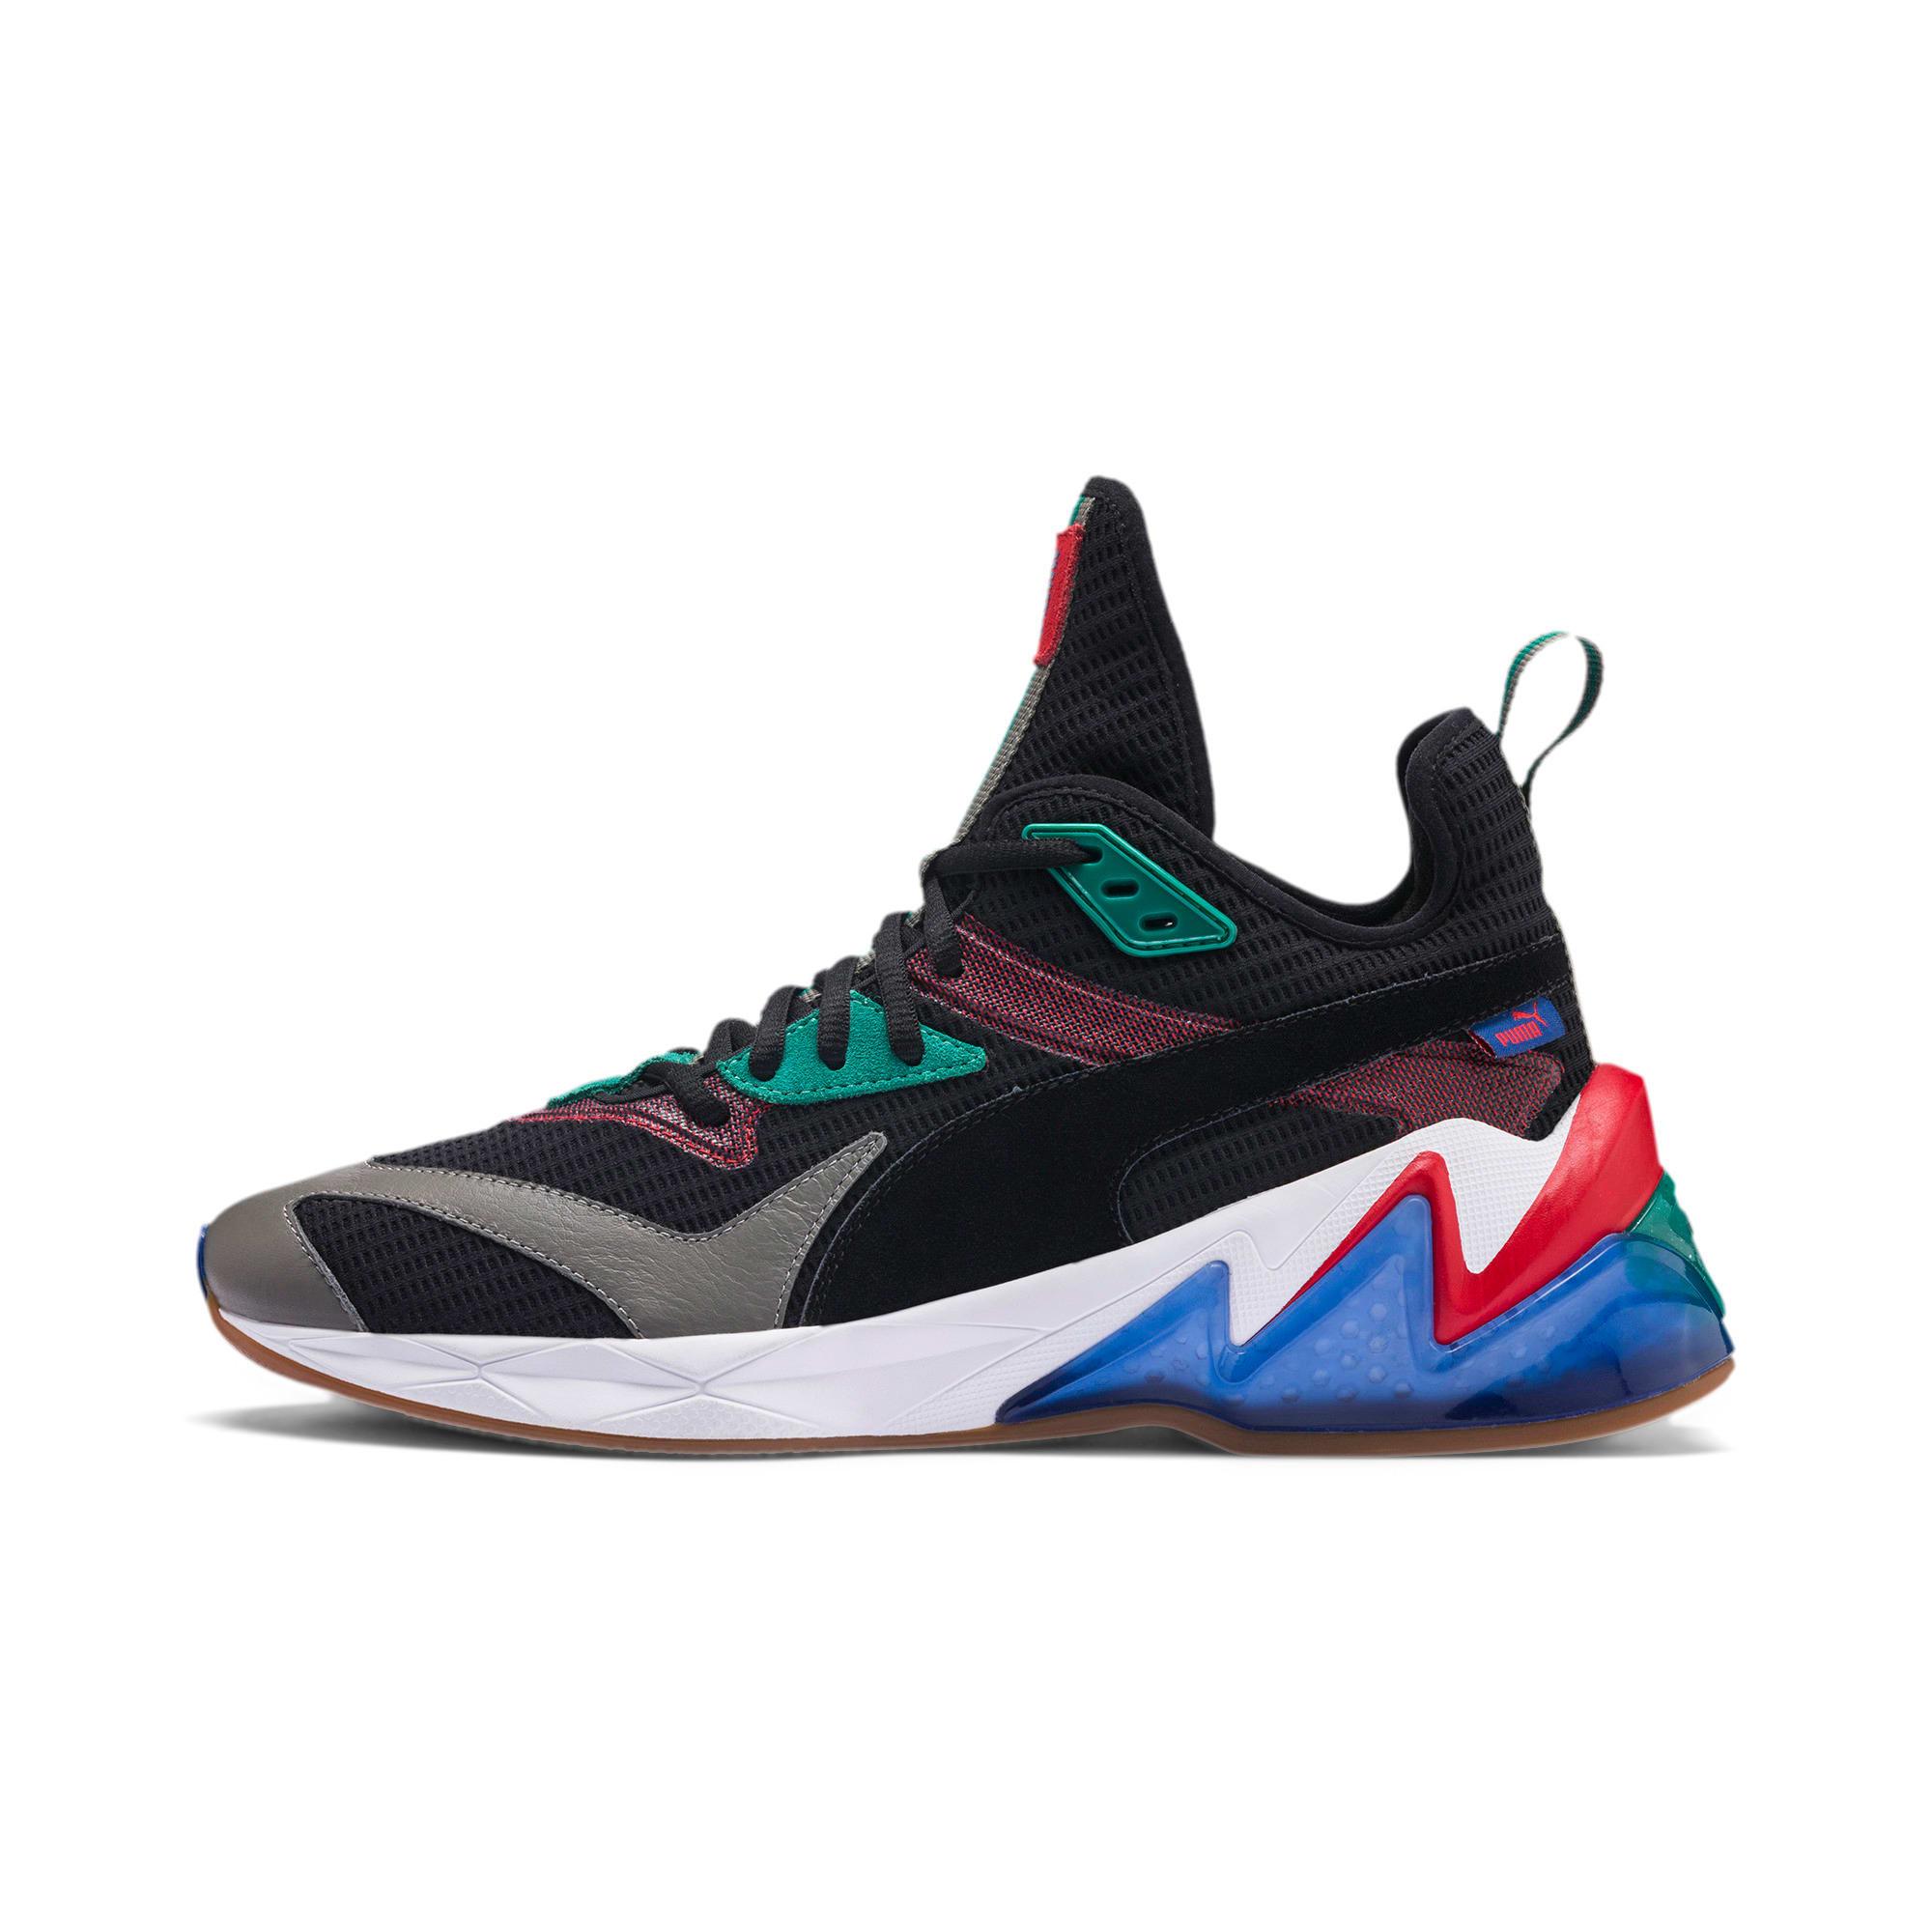 Thumbnail 1 of LQDCELL Origin Men's Training Shoes, Puma Black-Cadmium Green, medium